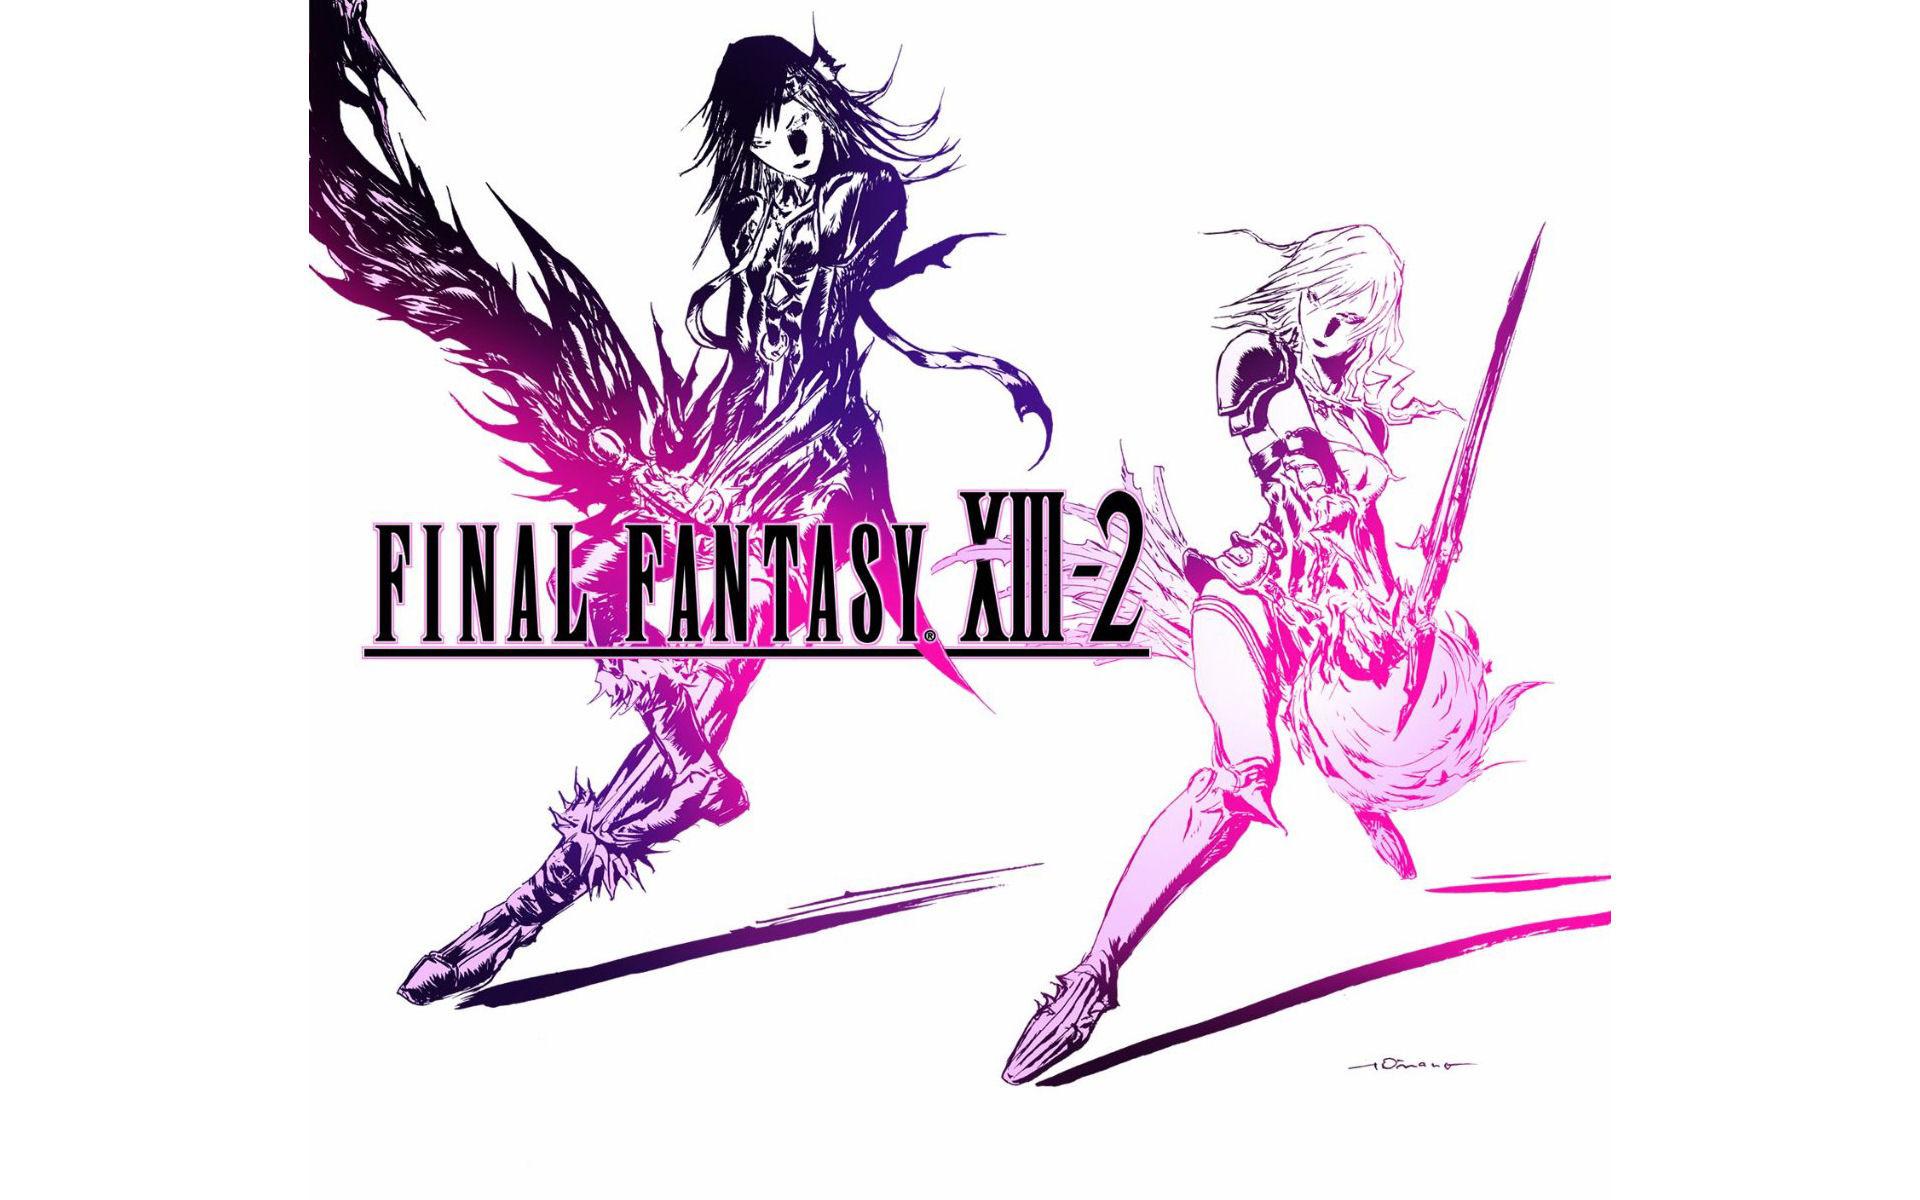 … final fantasy xiii 2 logo wallpaper 1 …